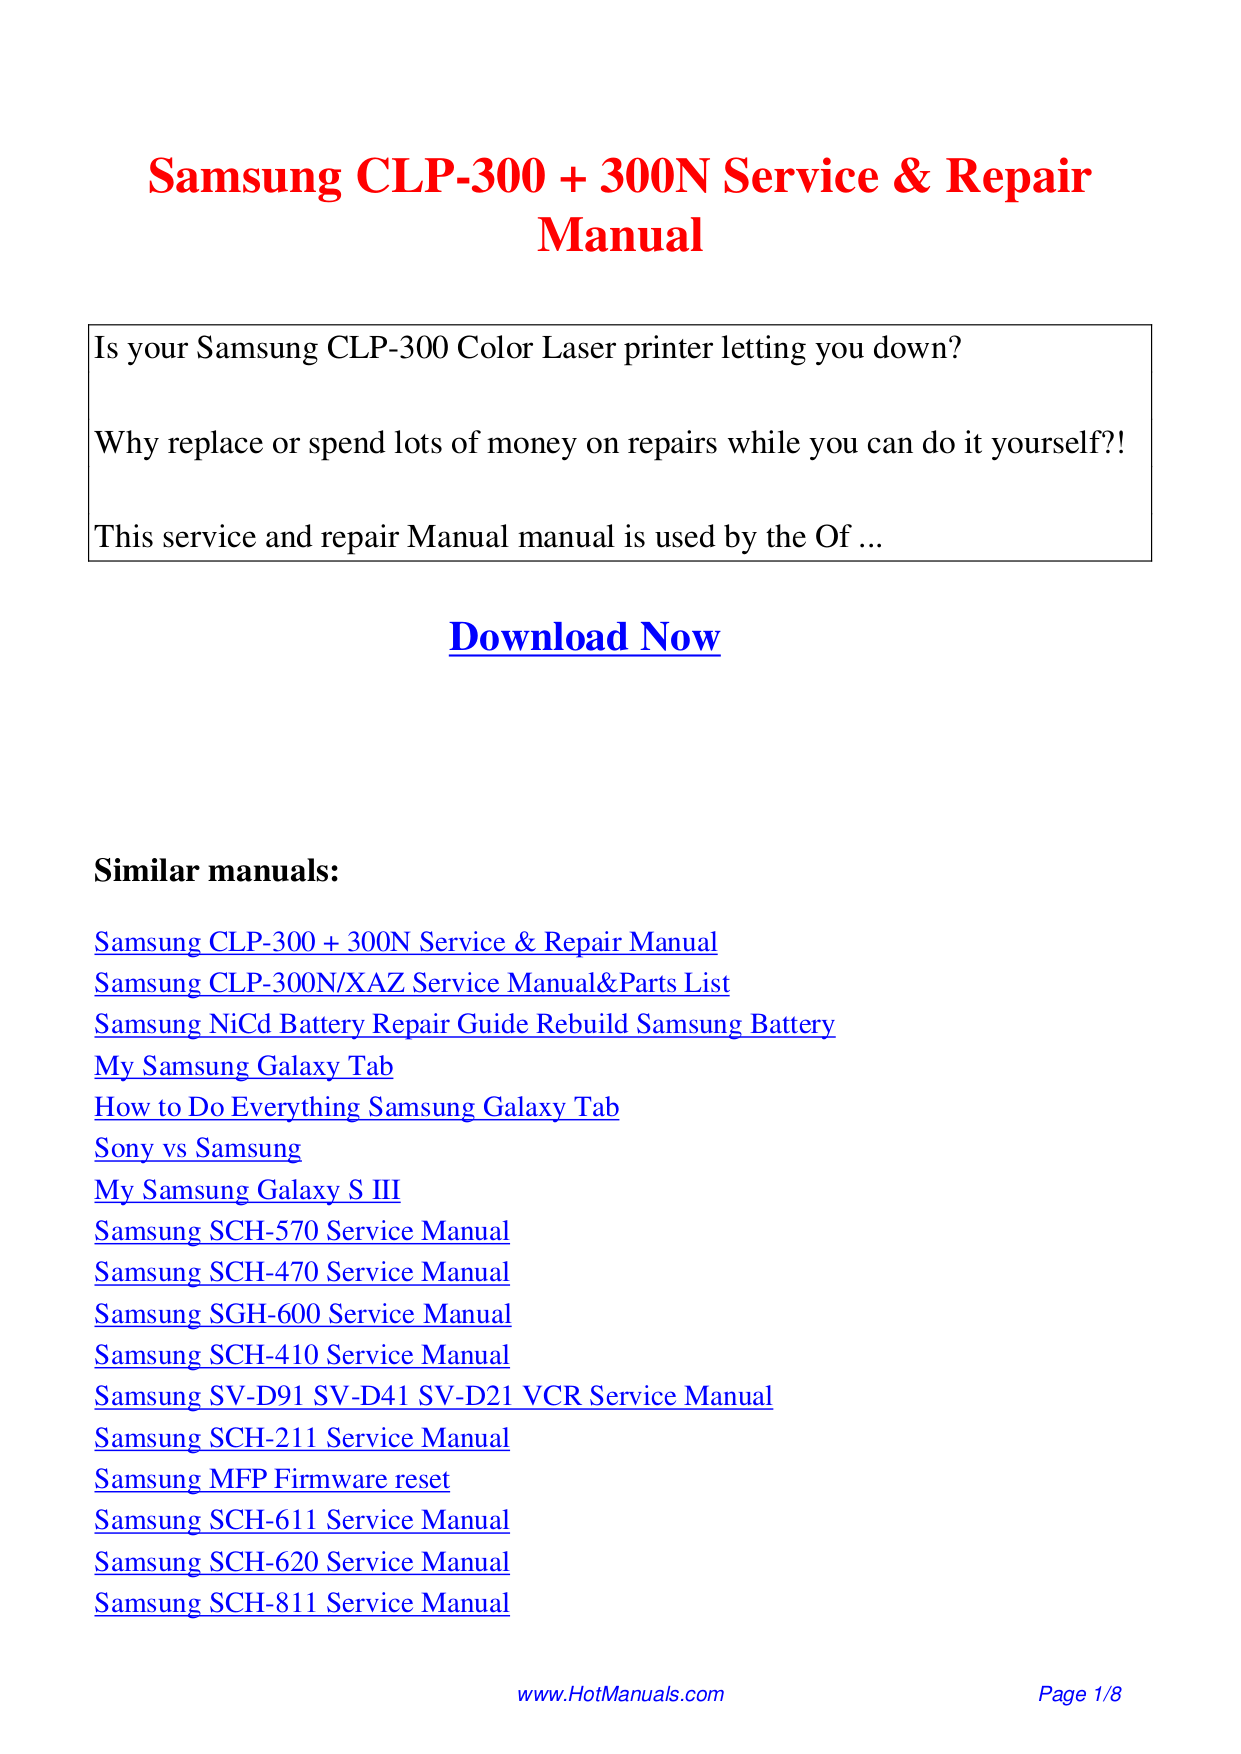 Samsung Clp 300 300n Service Repair Manual